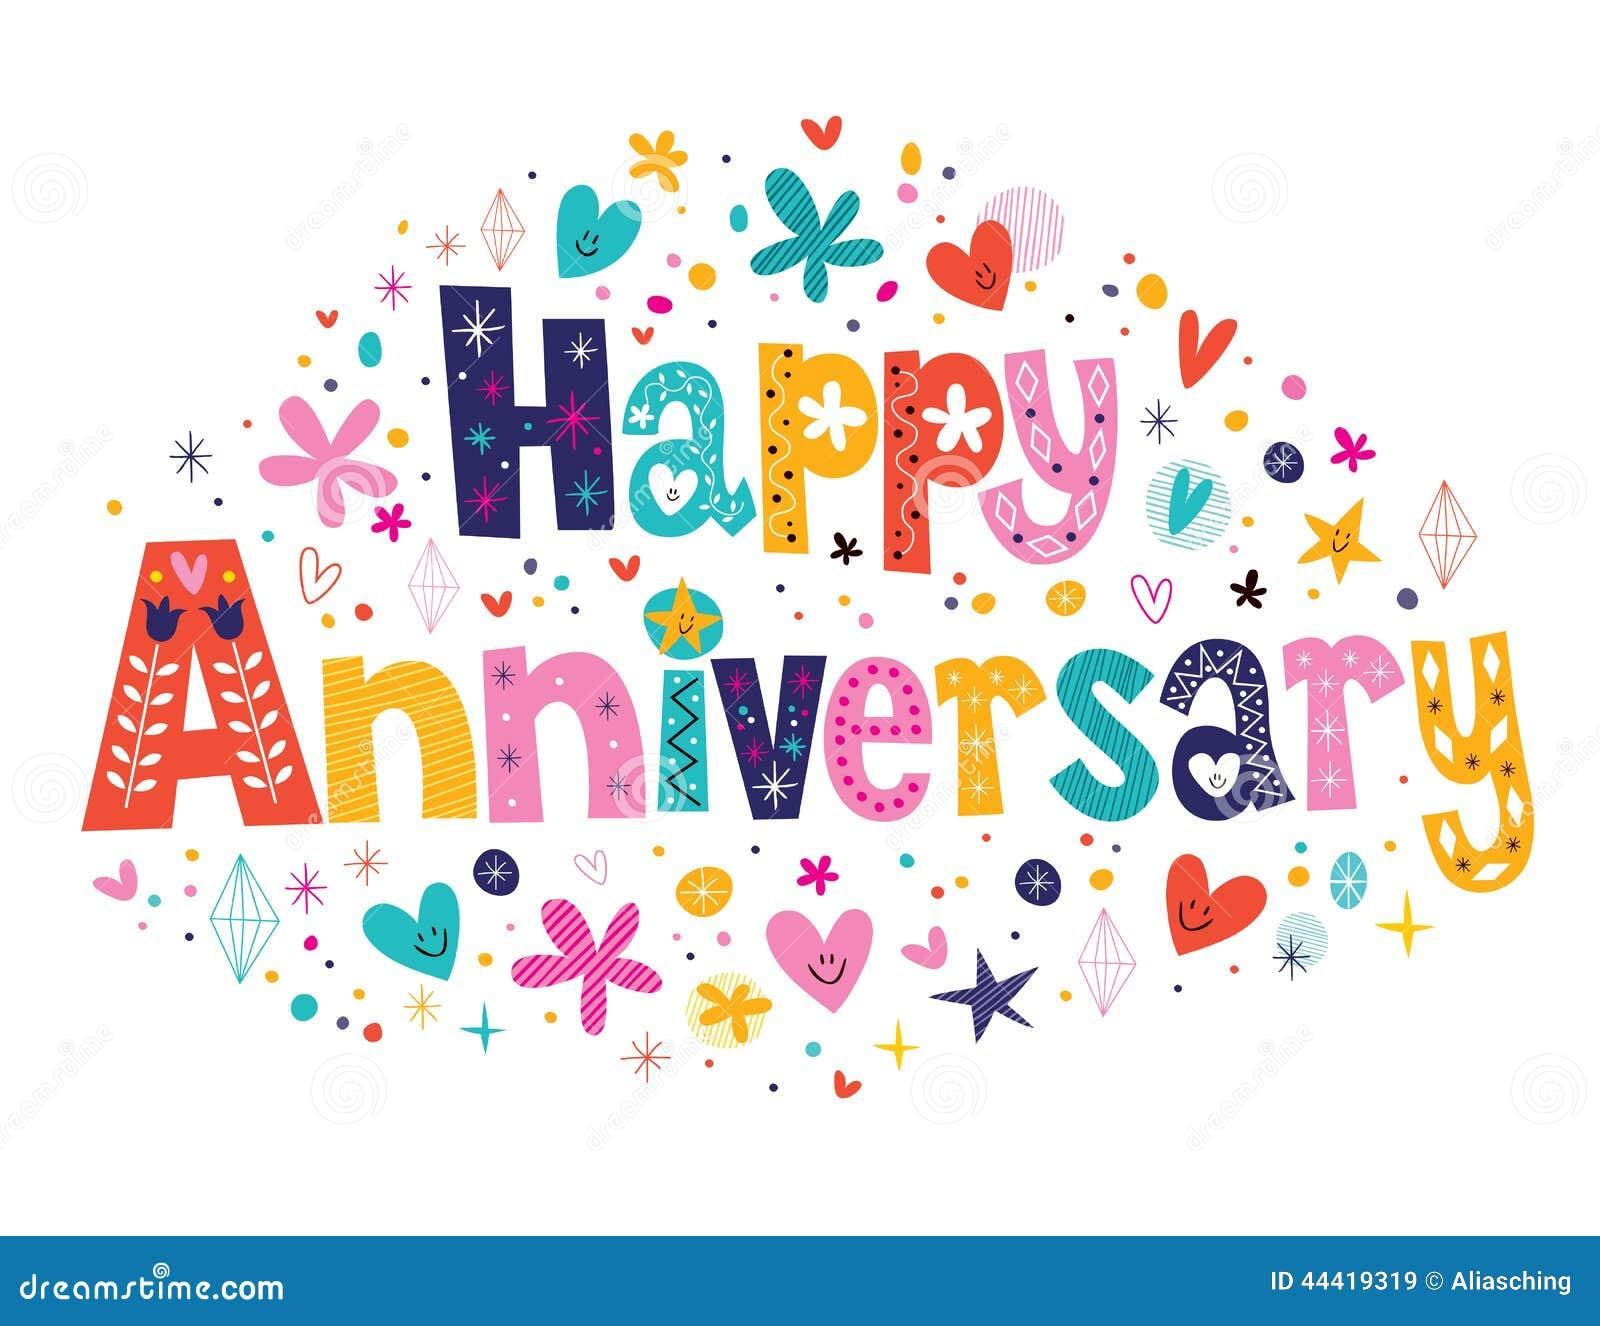 Happy Anniversary Clip Art Happy Anniversary Stock Vector - Image: 44419319